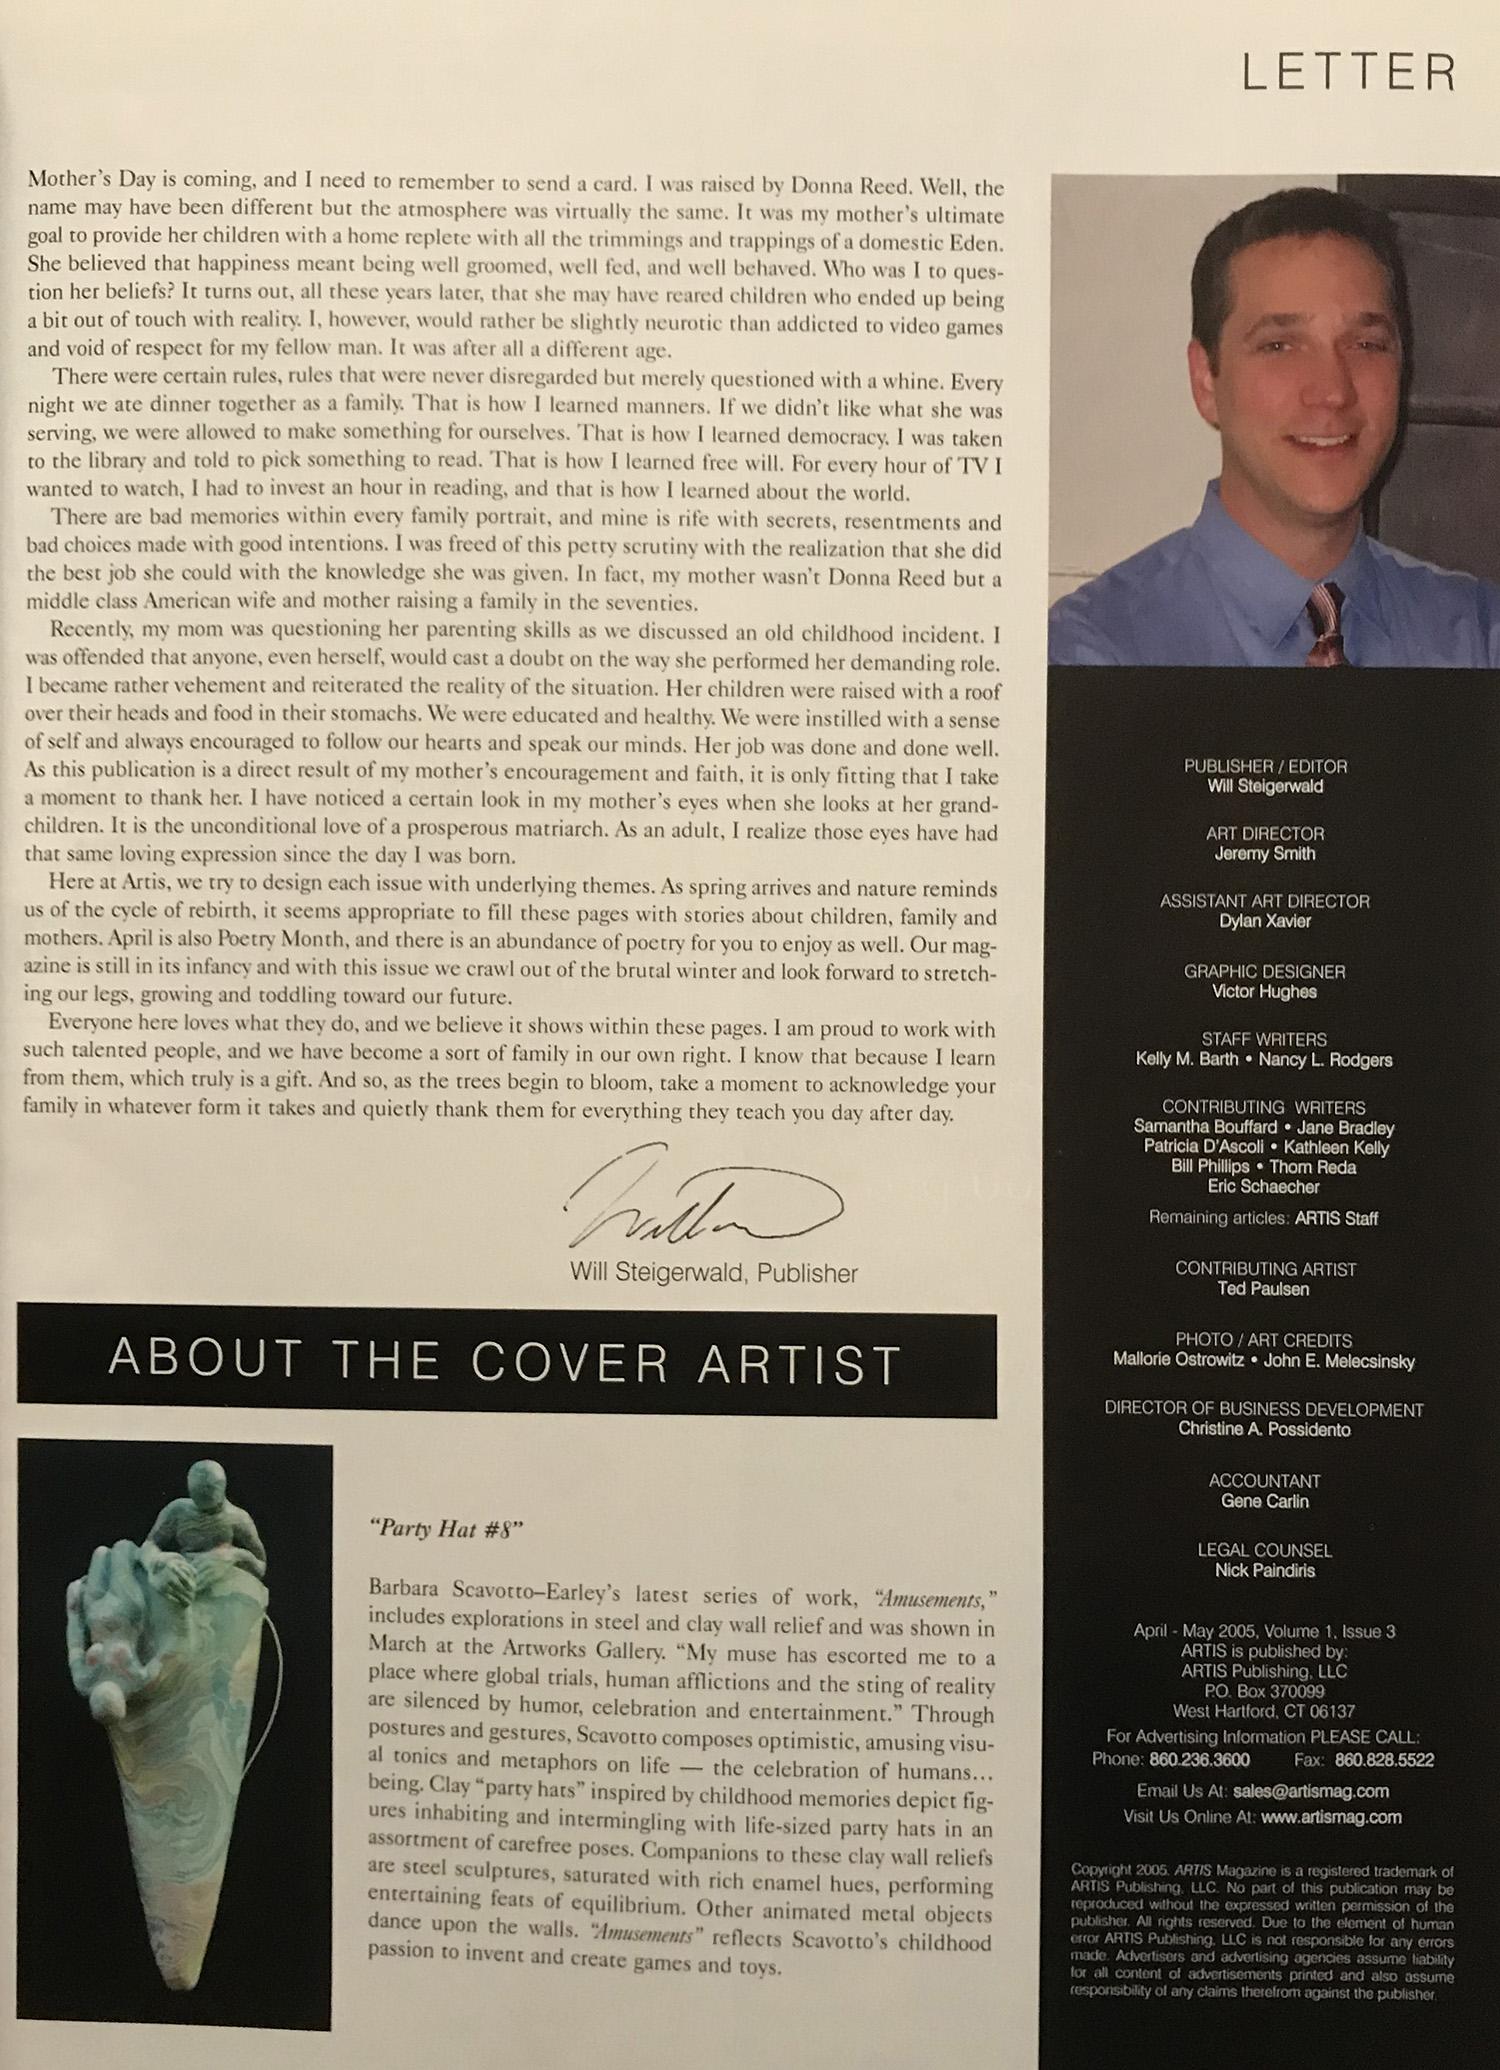 artismagazine-volume1-issue3_april-may2005_coverartist.jpg